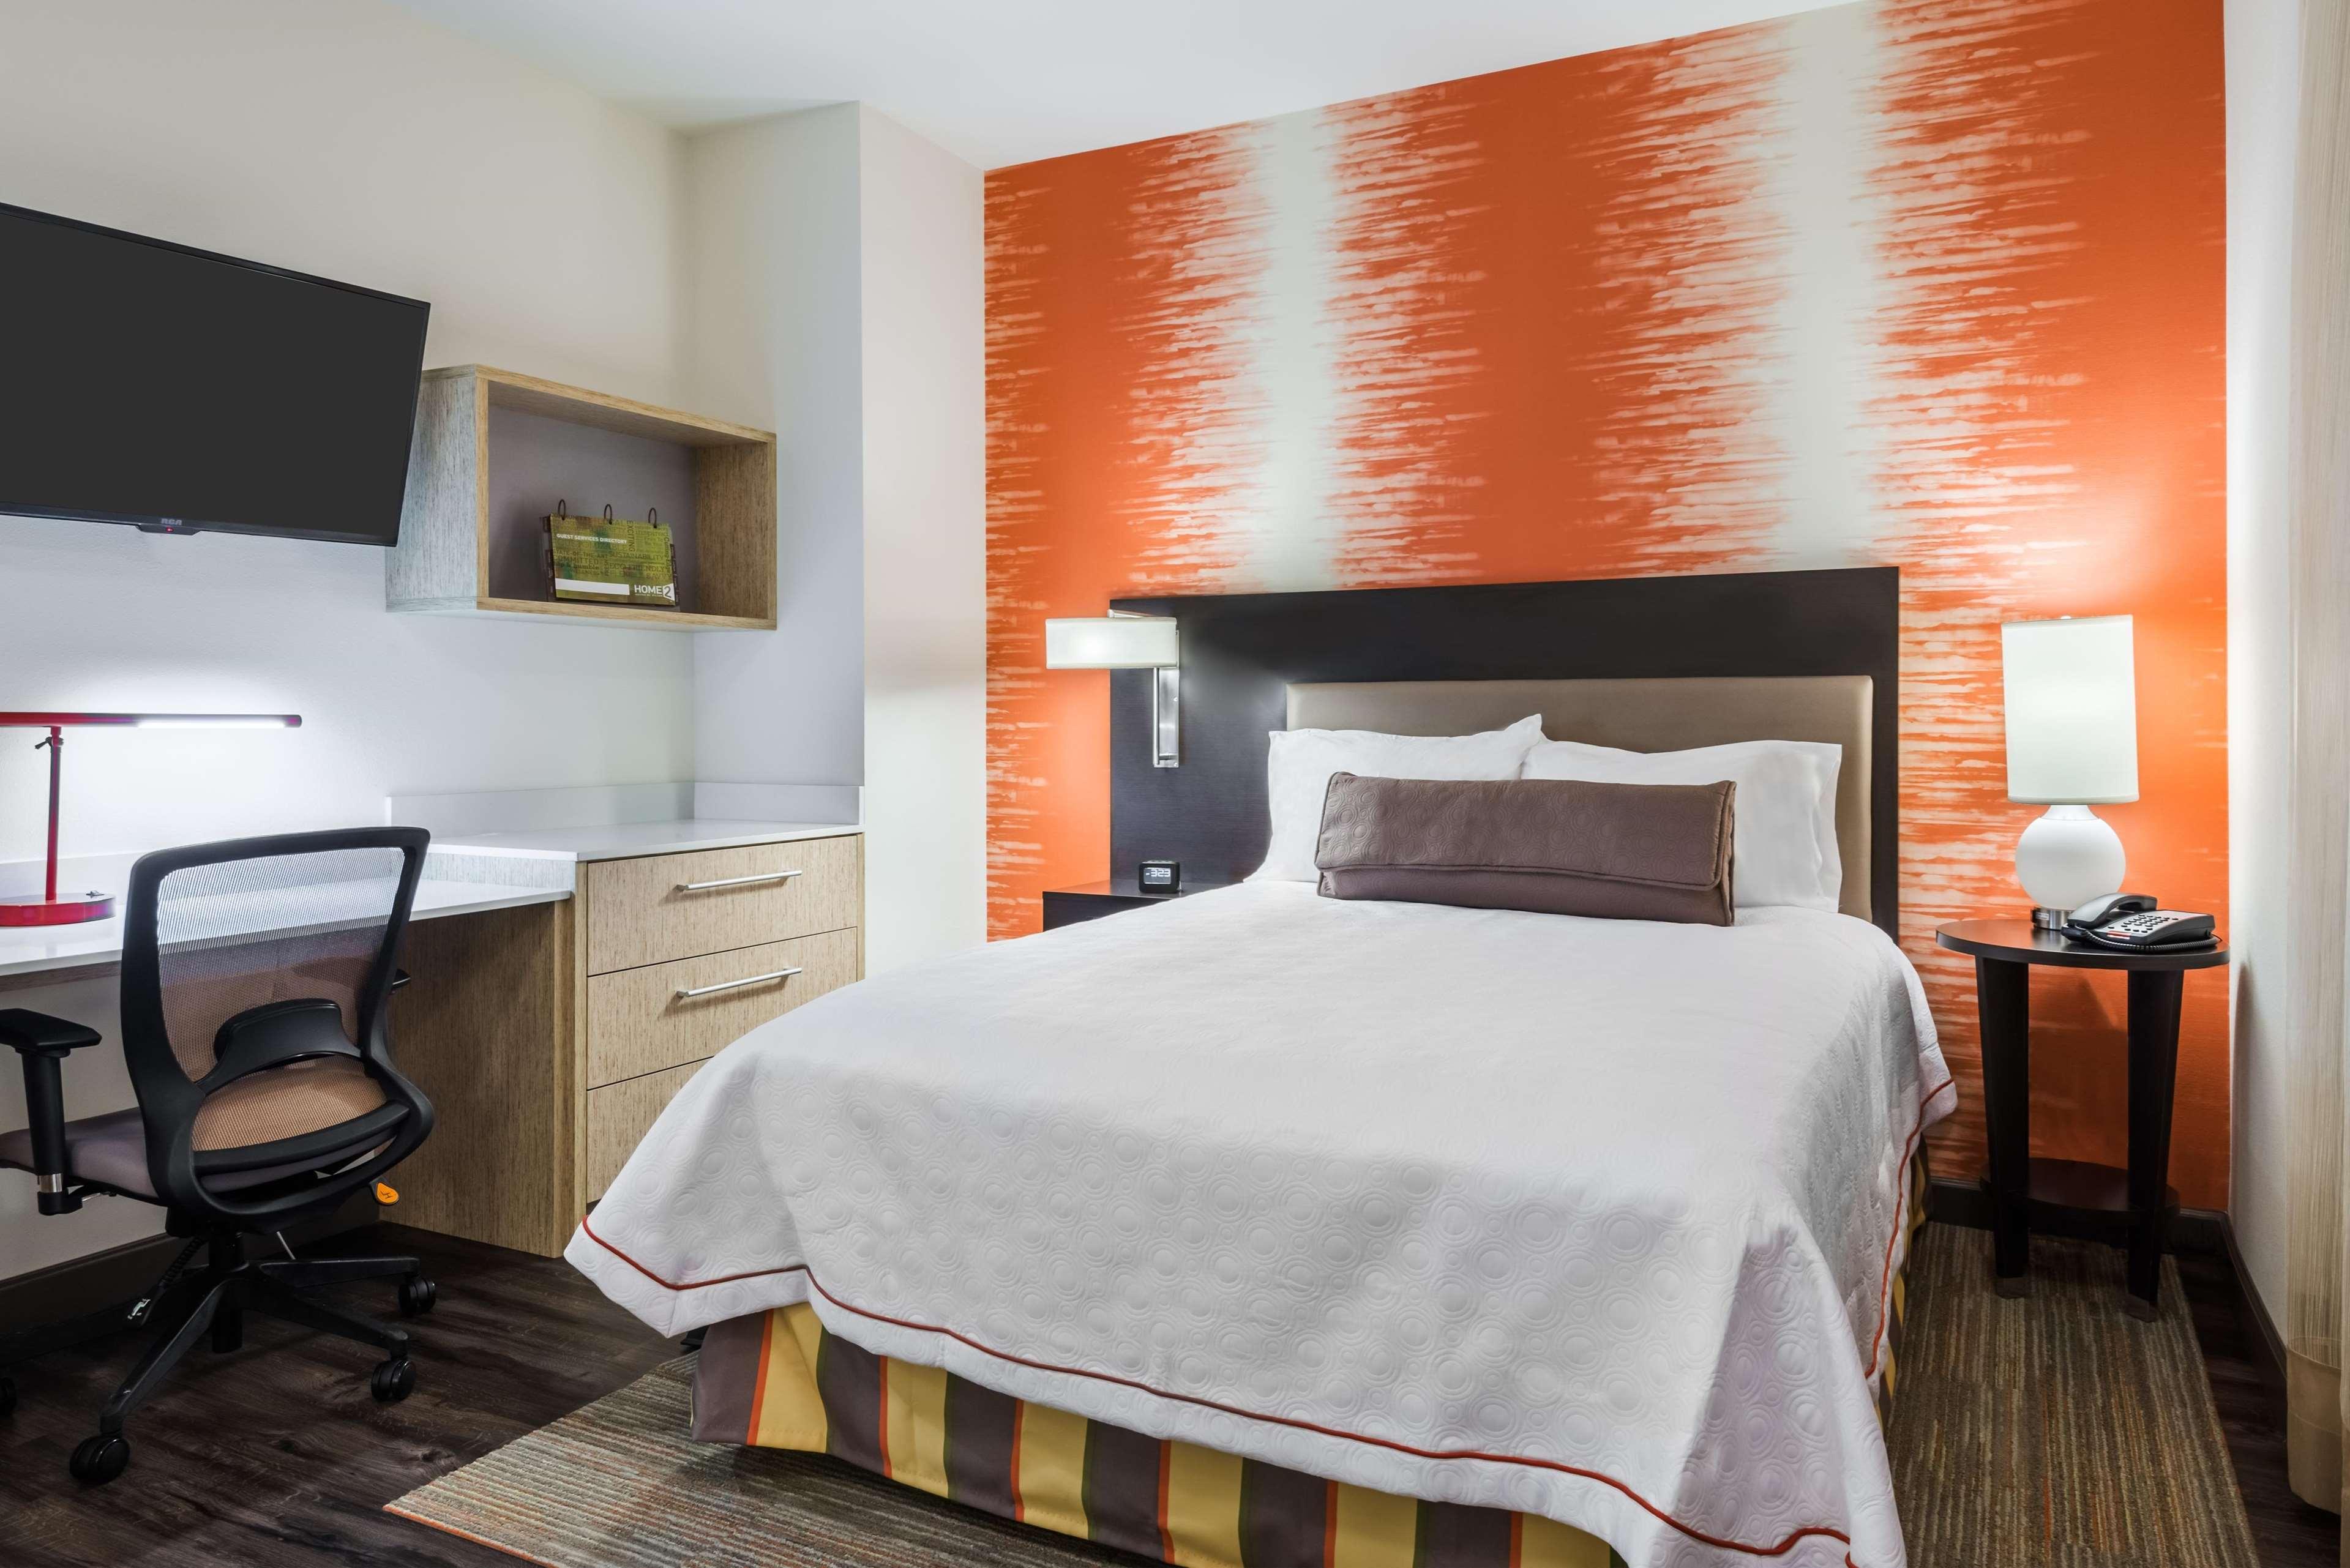 Home2 Suites by Hilton Atlanta Downtown image 10